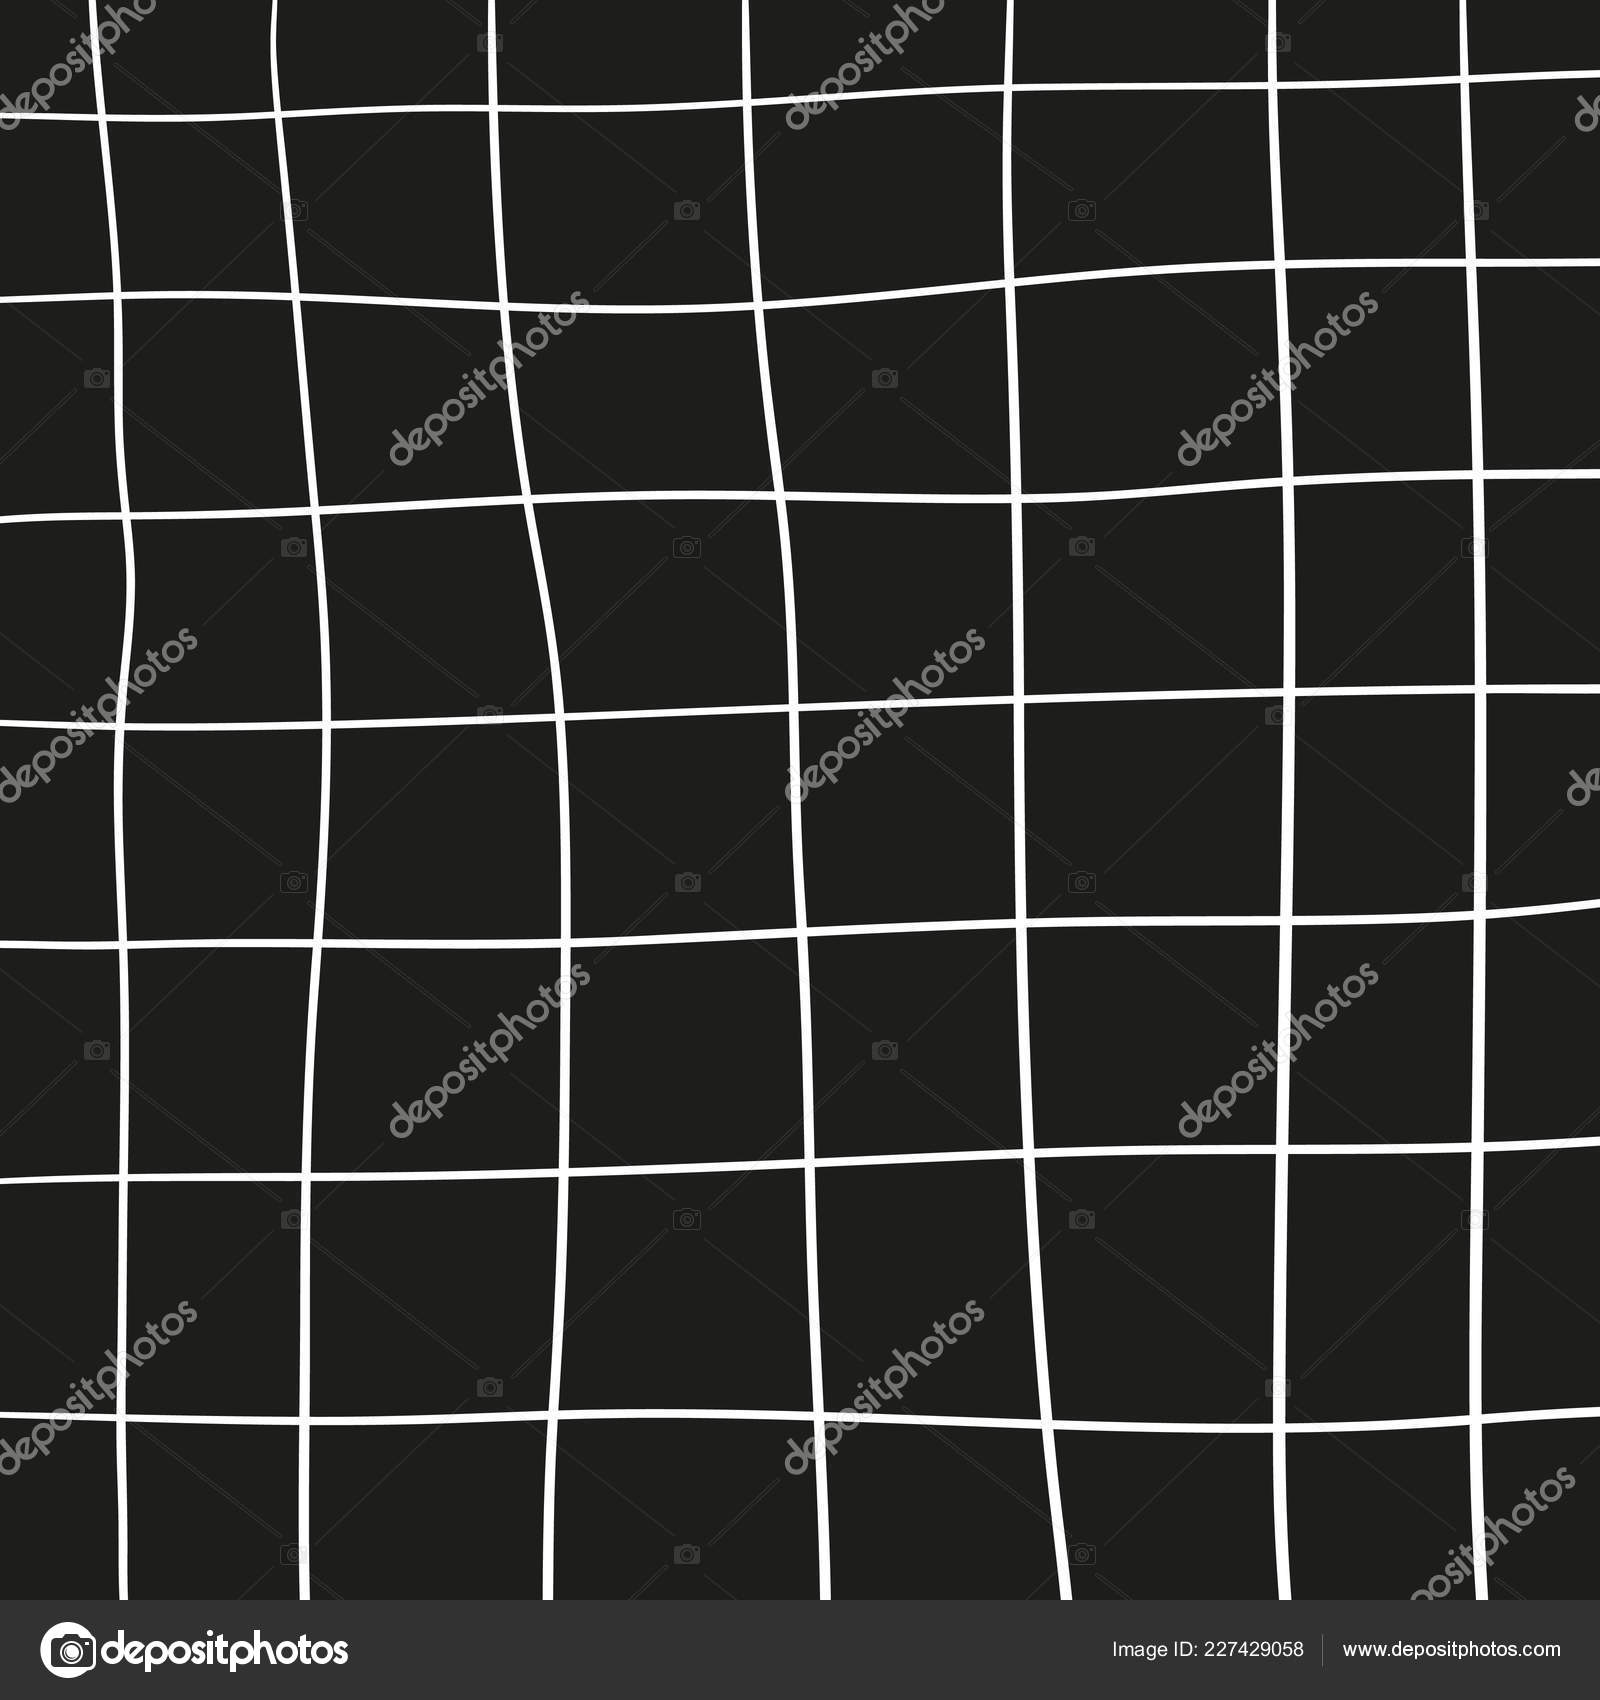 Black White Pattern Grid Background Simple Scandinavian Design Stock Vector C Knstart 227429058